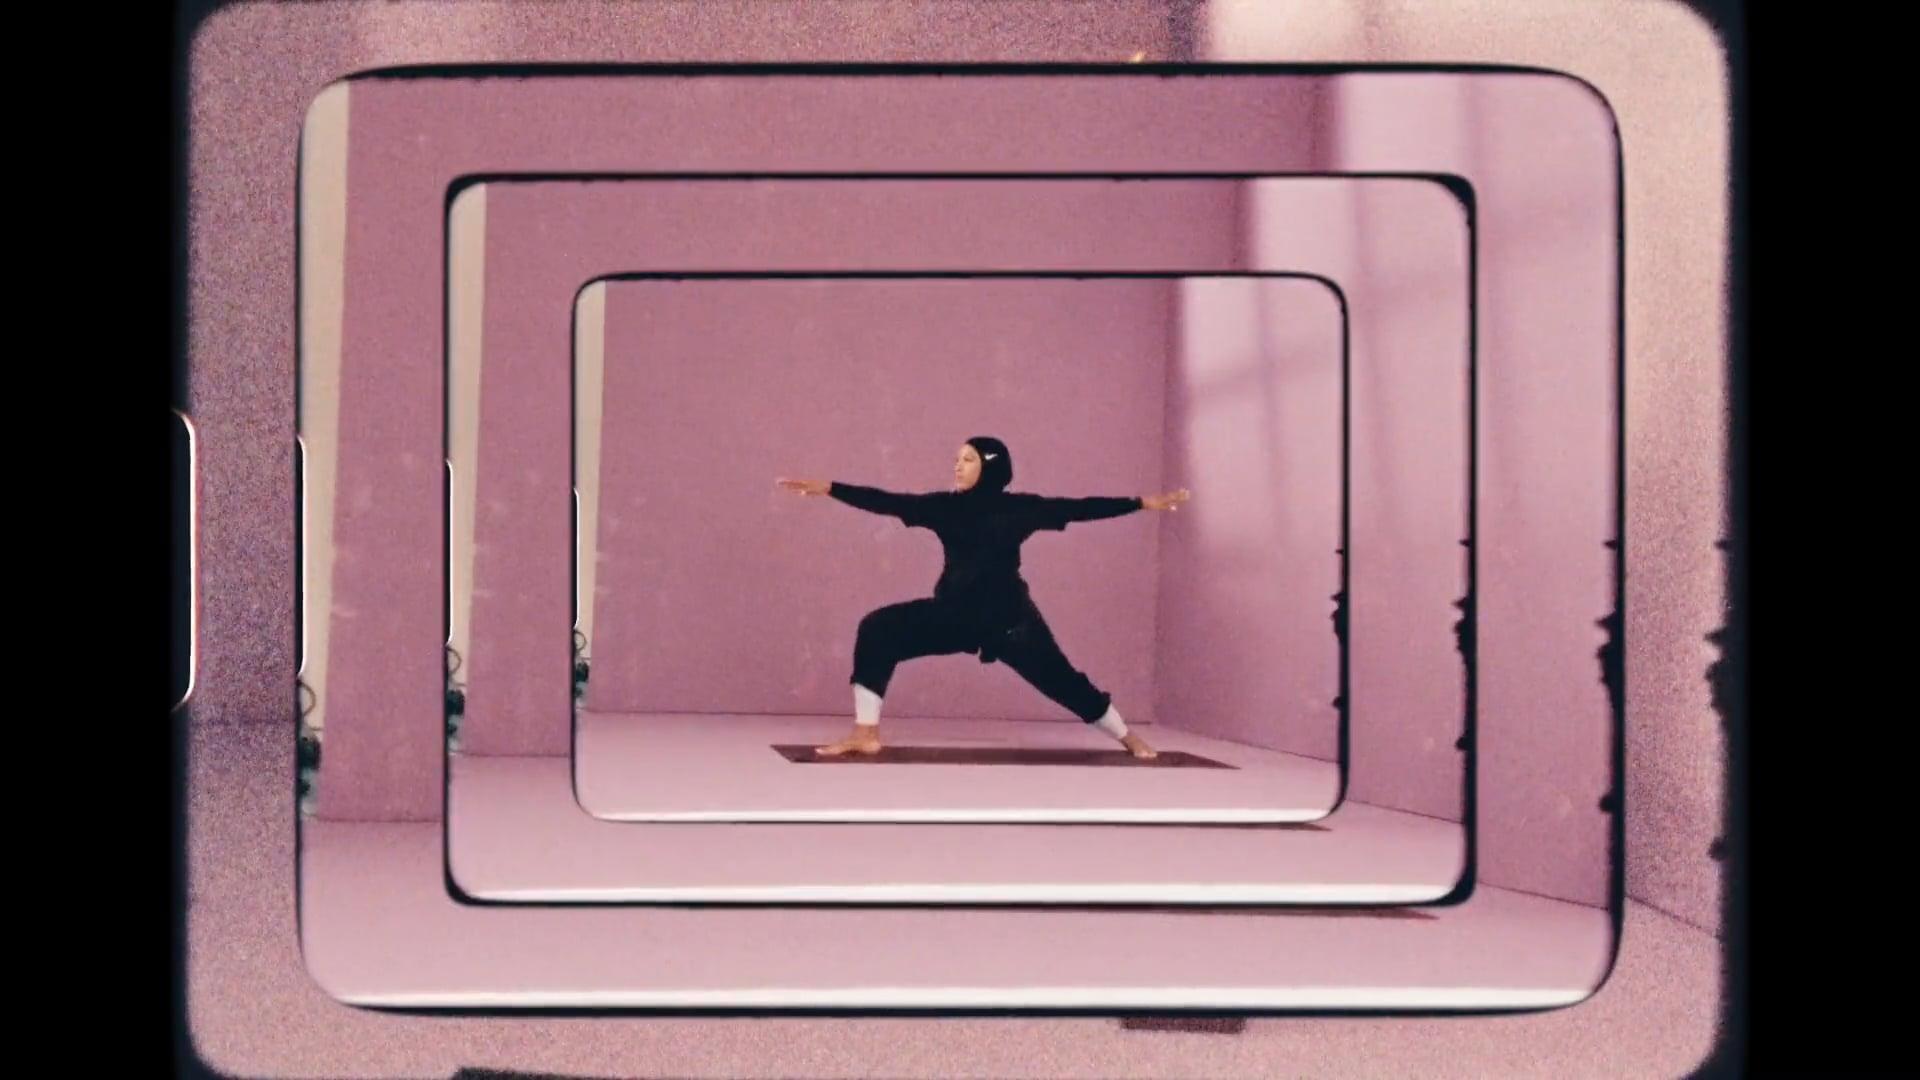 Nike - Yoga Transforms: Six Athletes